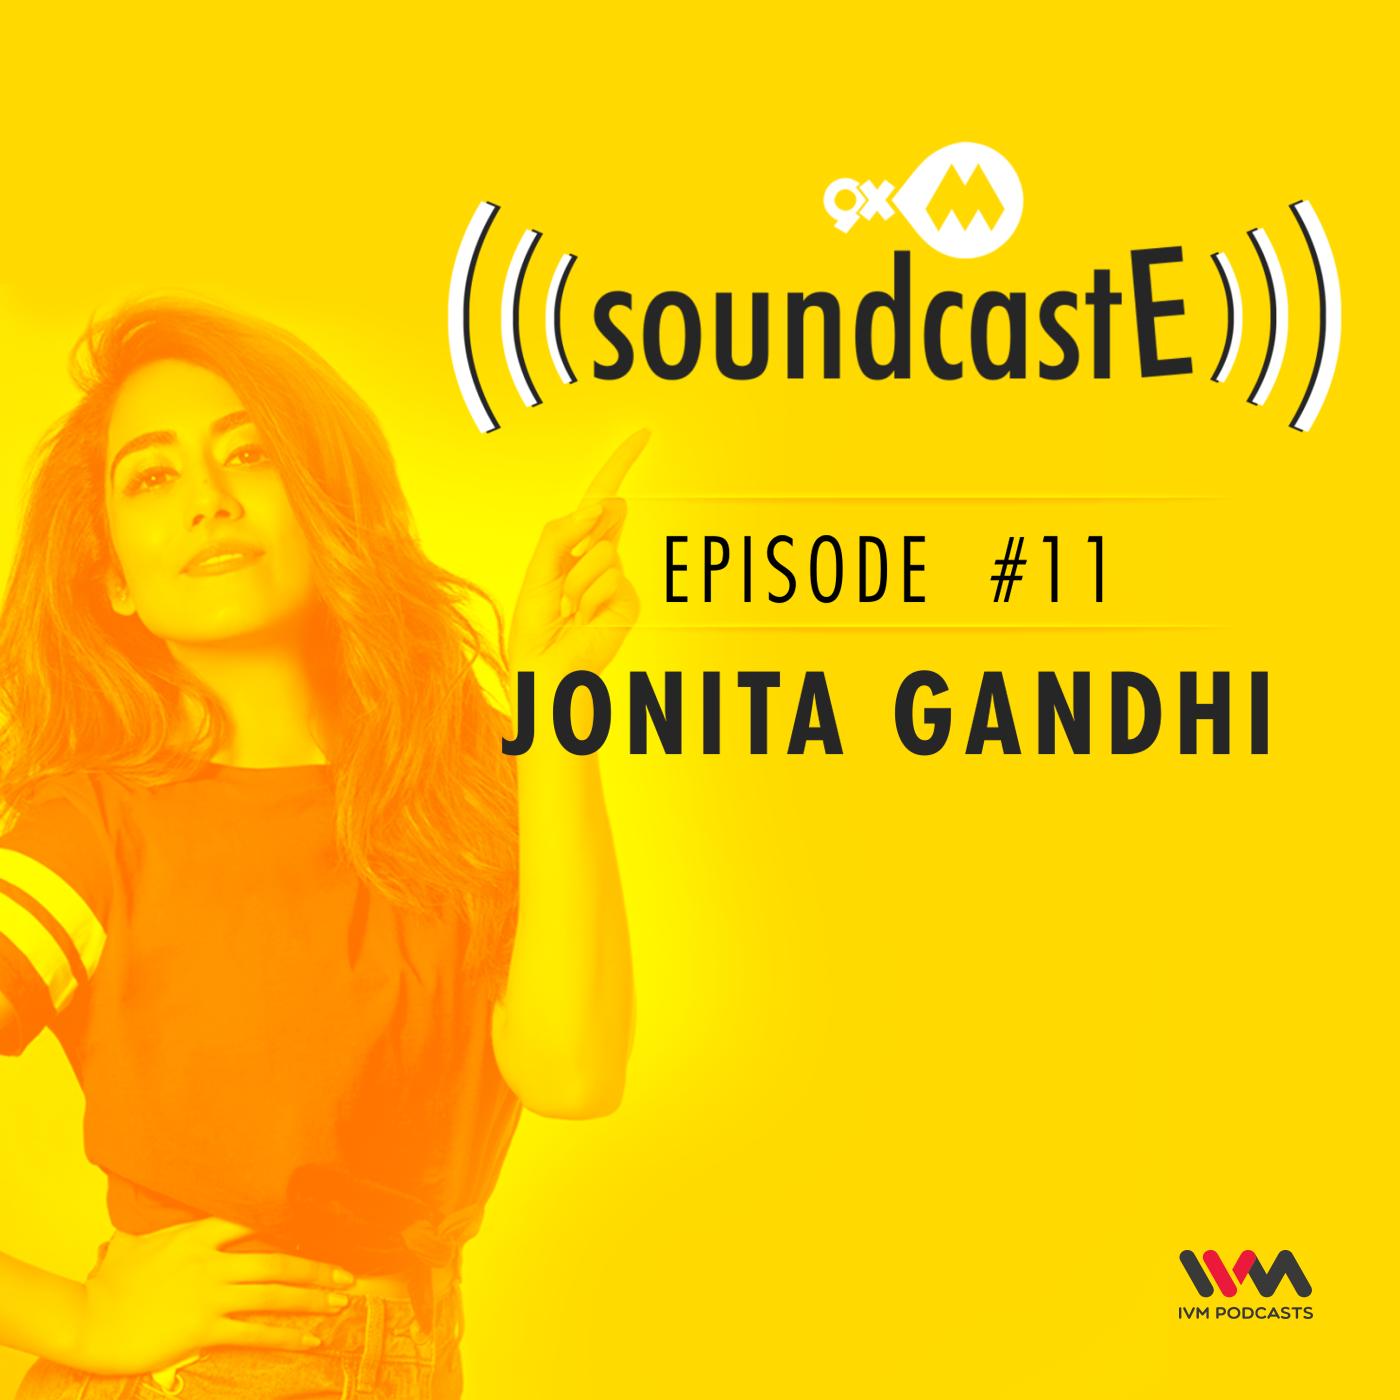 Ep. 11: 9XM SoundcastE with Jonita Gandhi